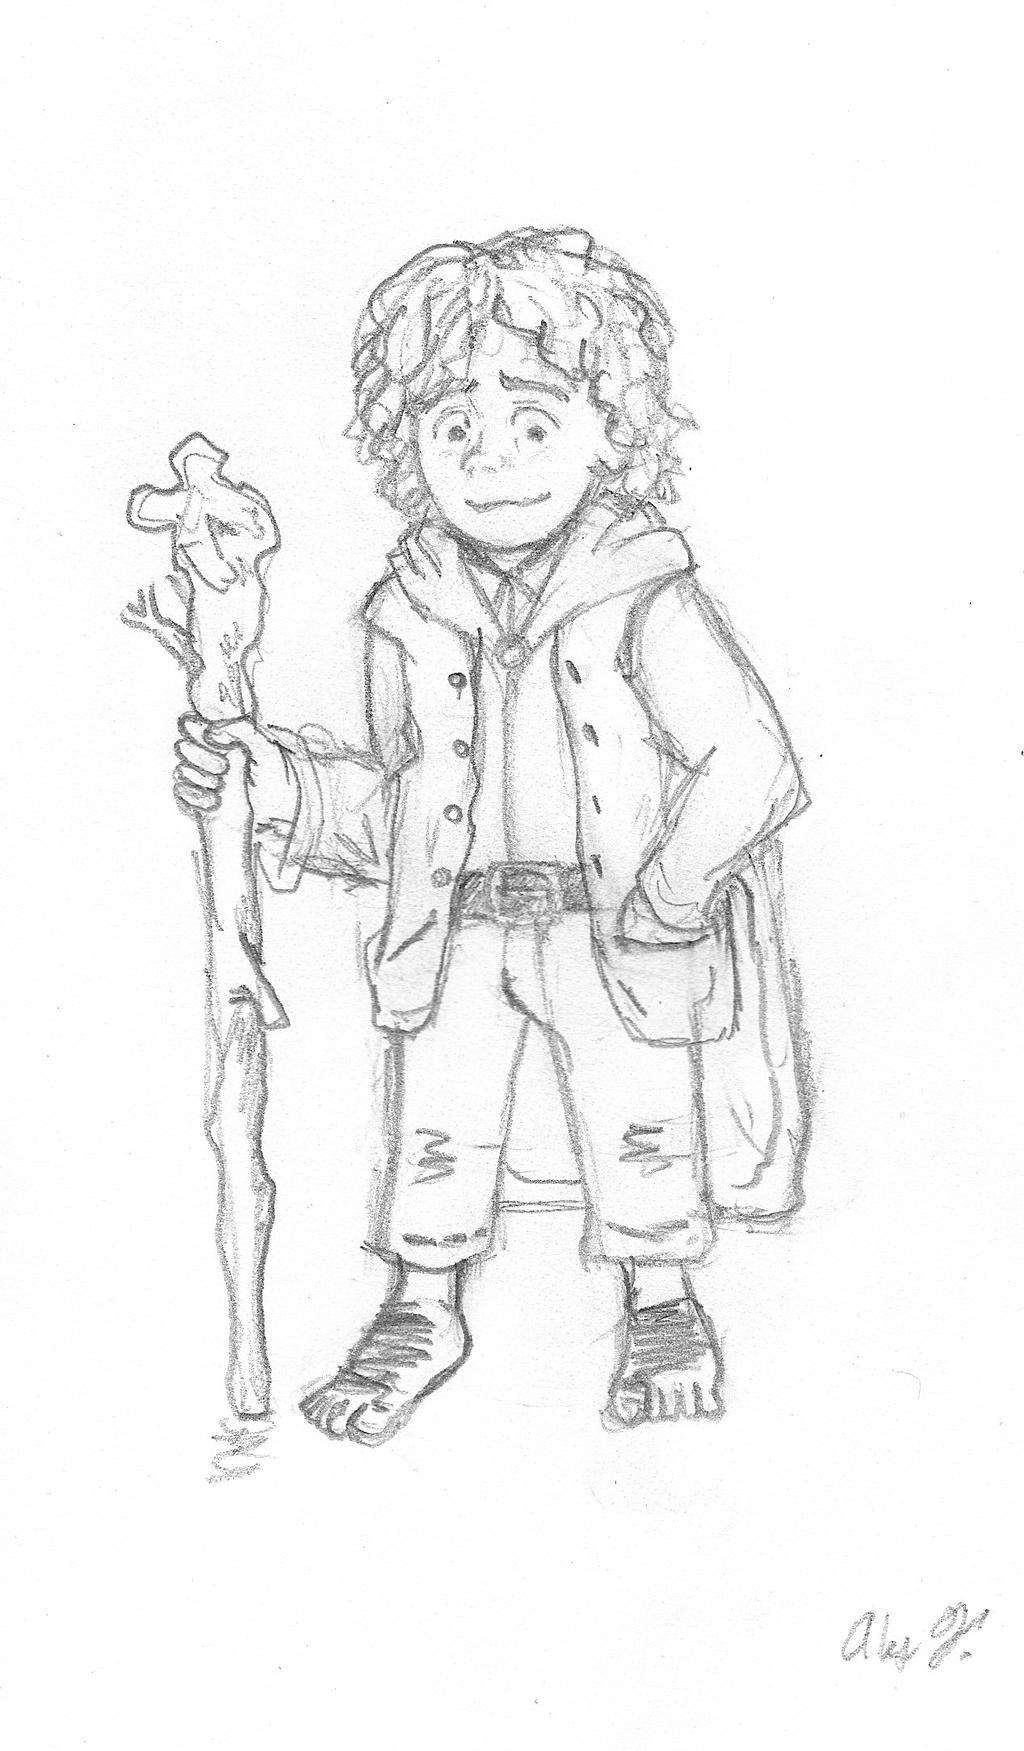 Day 6: Bilbo Baggins by axelintu